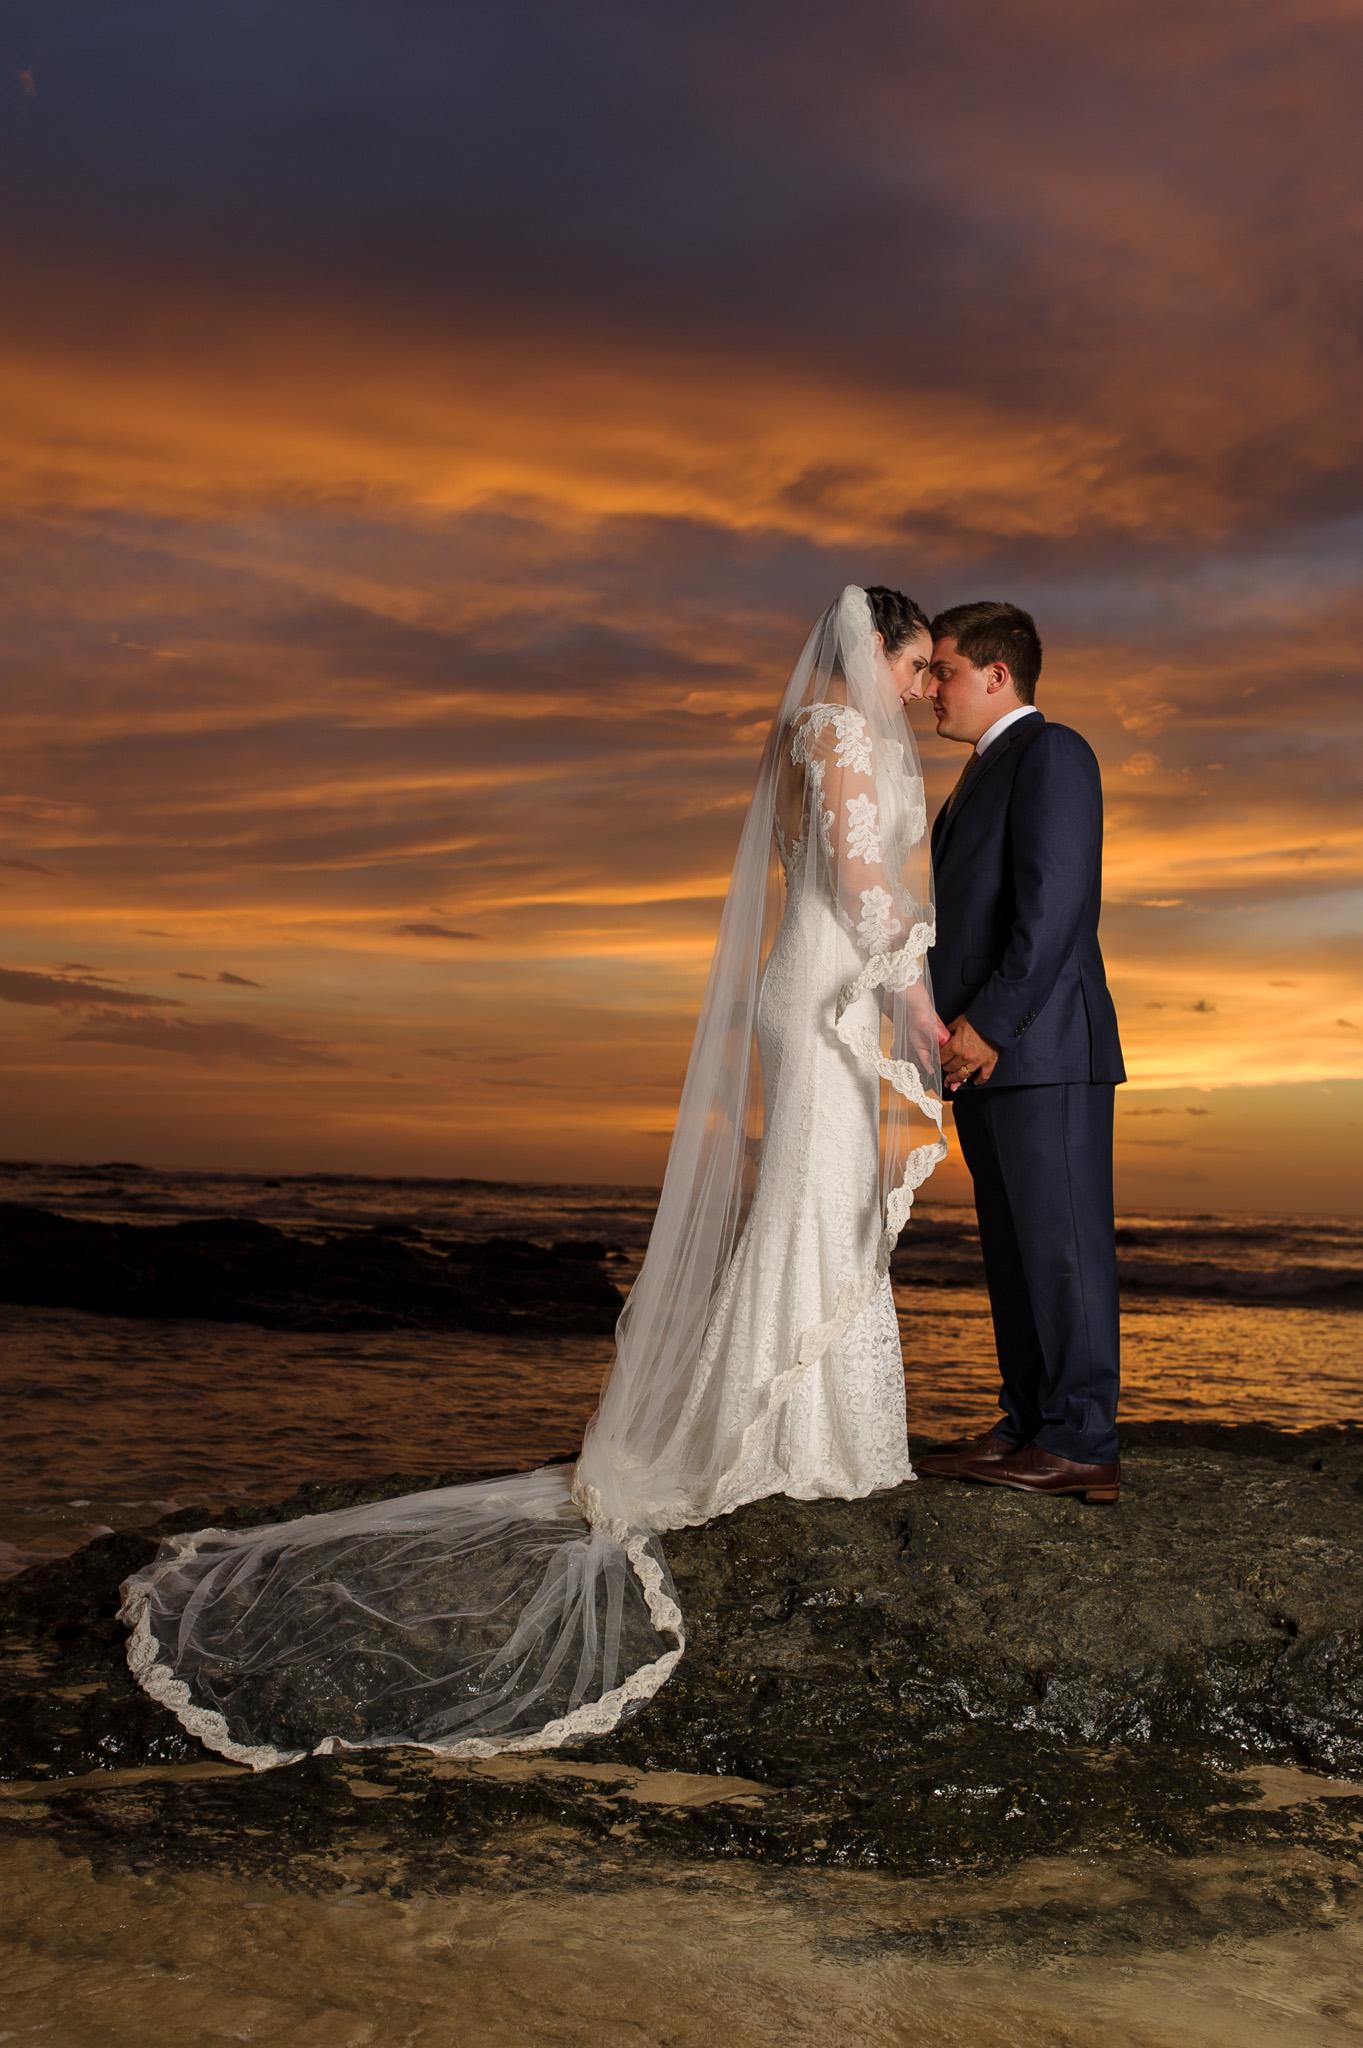 Costa Rica weddings Photos sunset